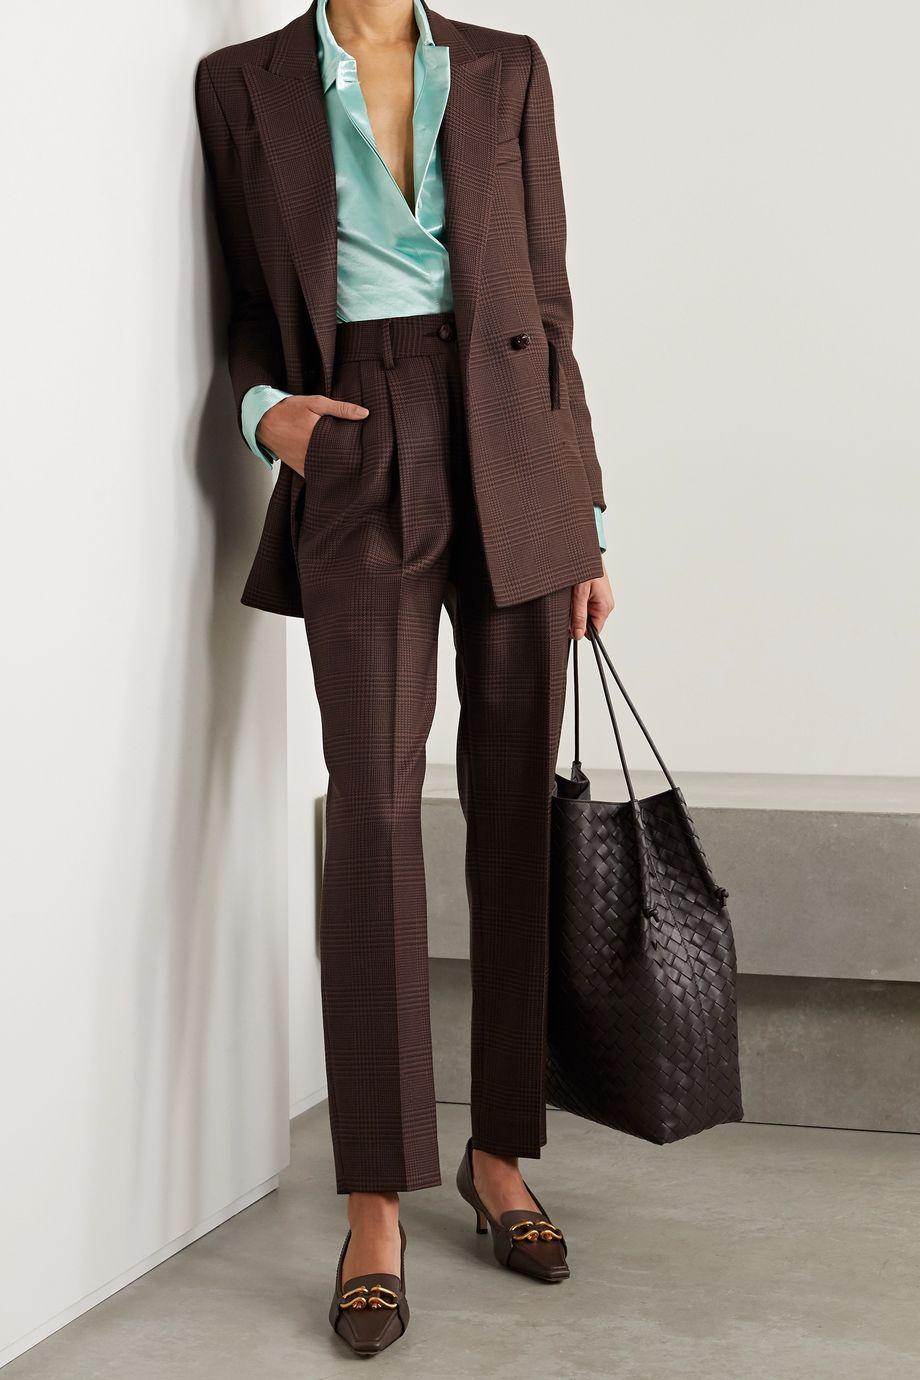 Blazé Milano Voyager Everyday 双排扣灯芯绒边饰格纹羊毛西装外套